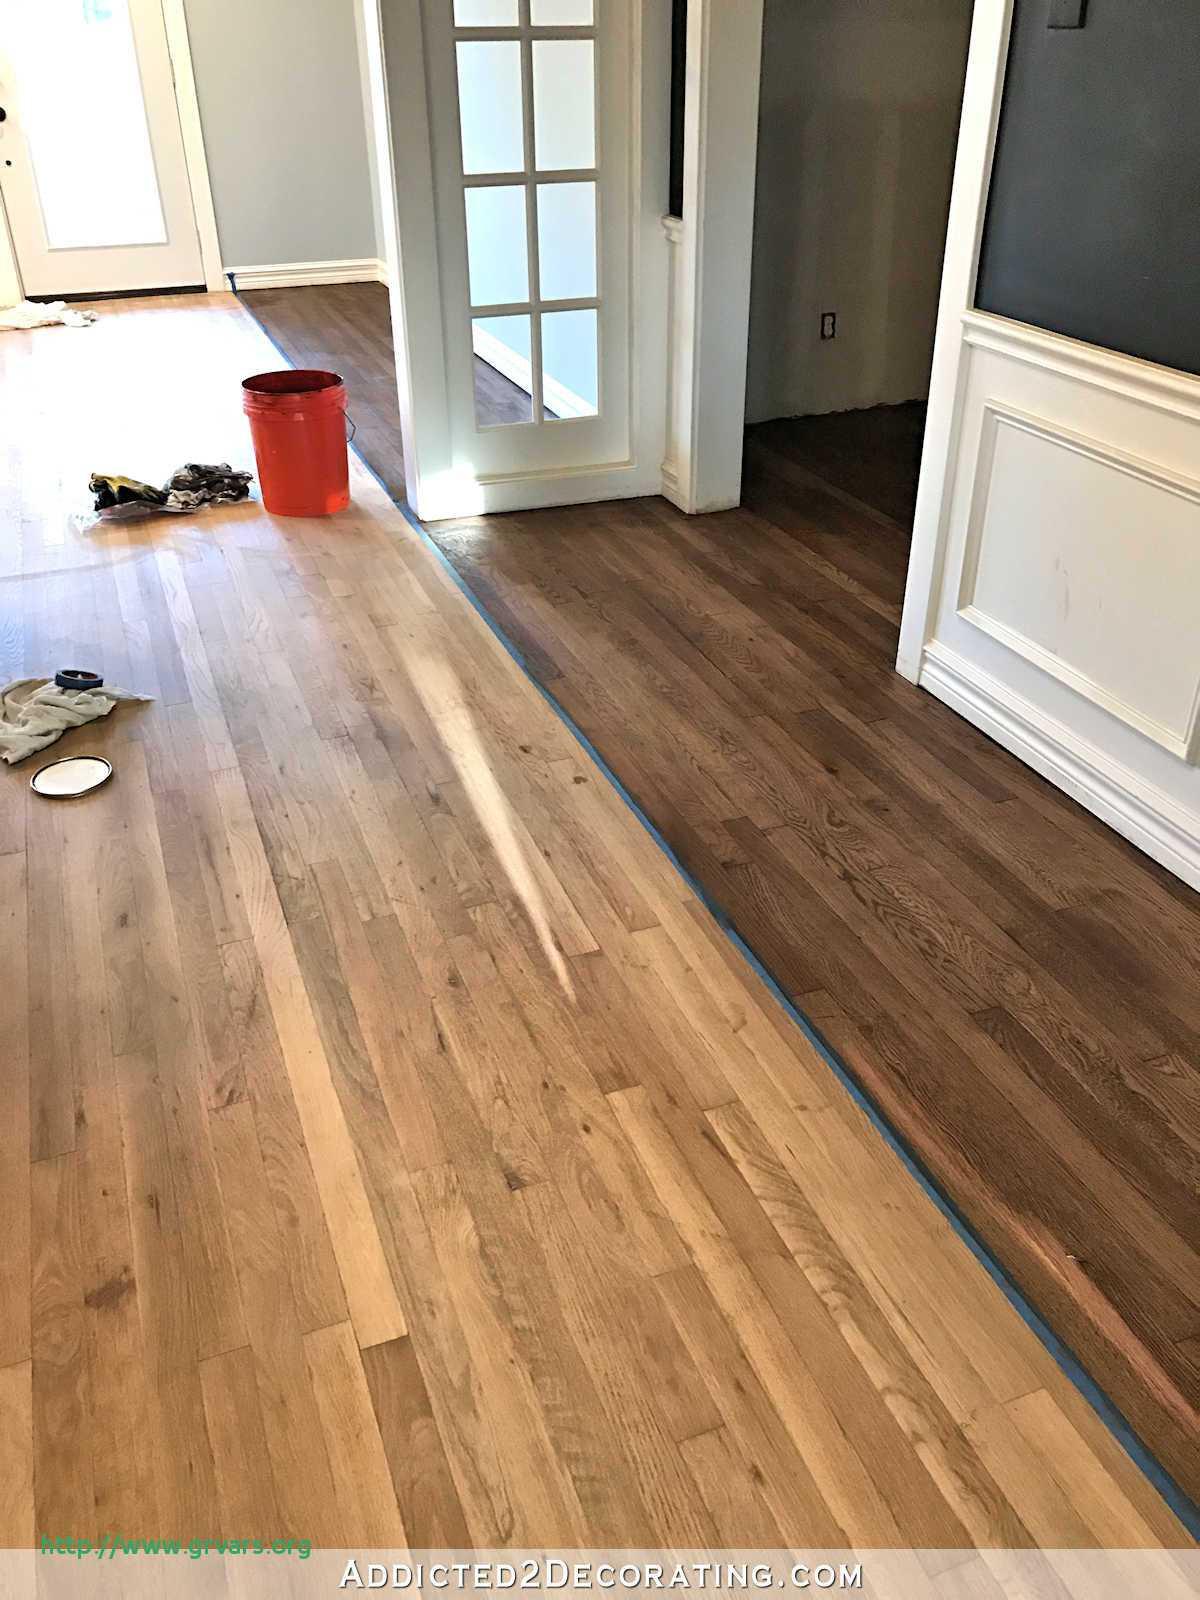 15 Best Hardwood Floor Refinishing Ottawa Unique Flooring Ideas